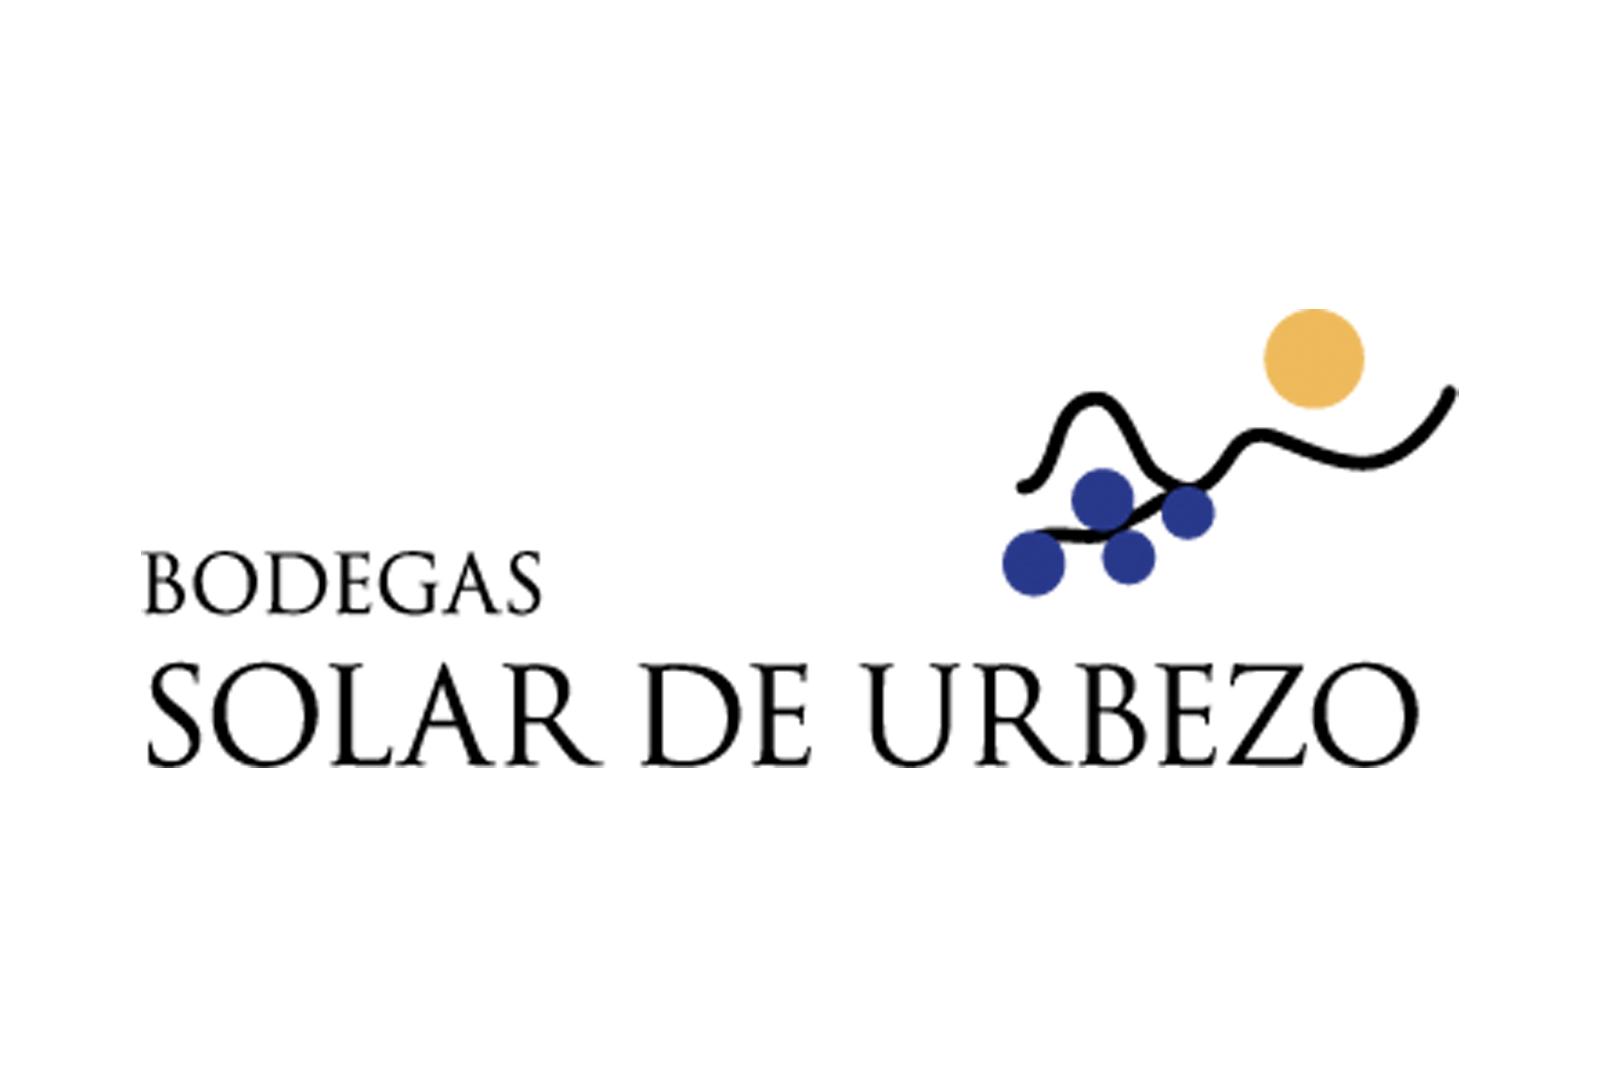 Piedras Urbezo Chardonnay 2015, medalla de oro.